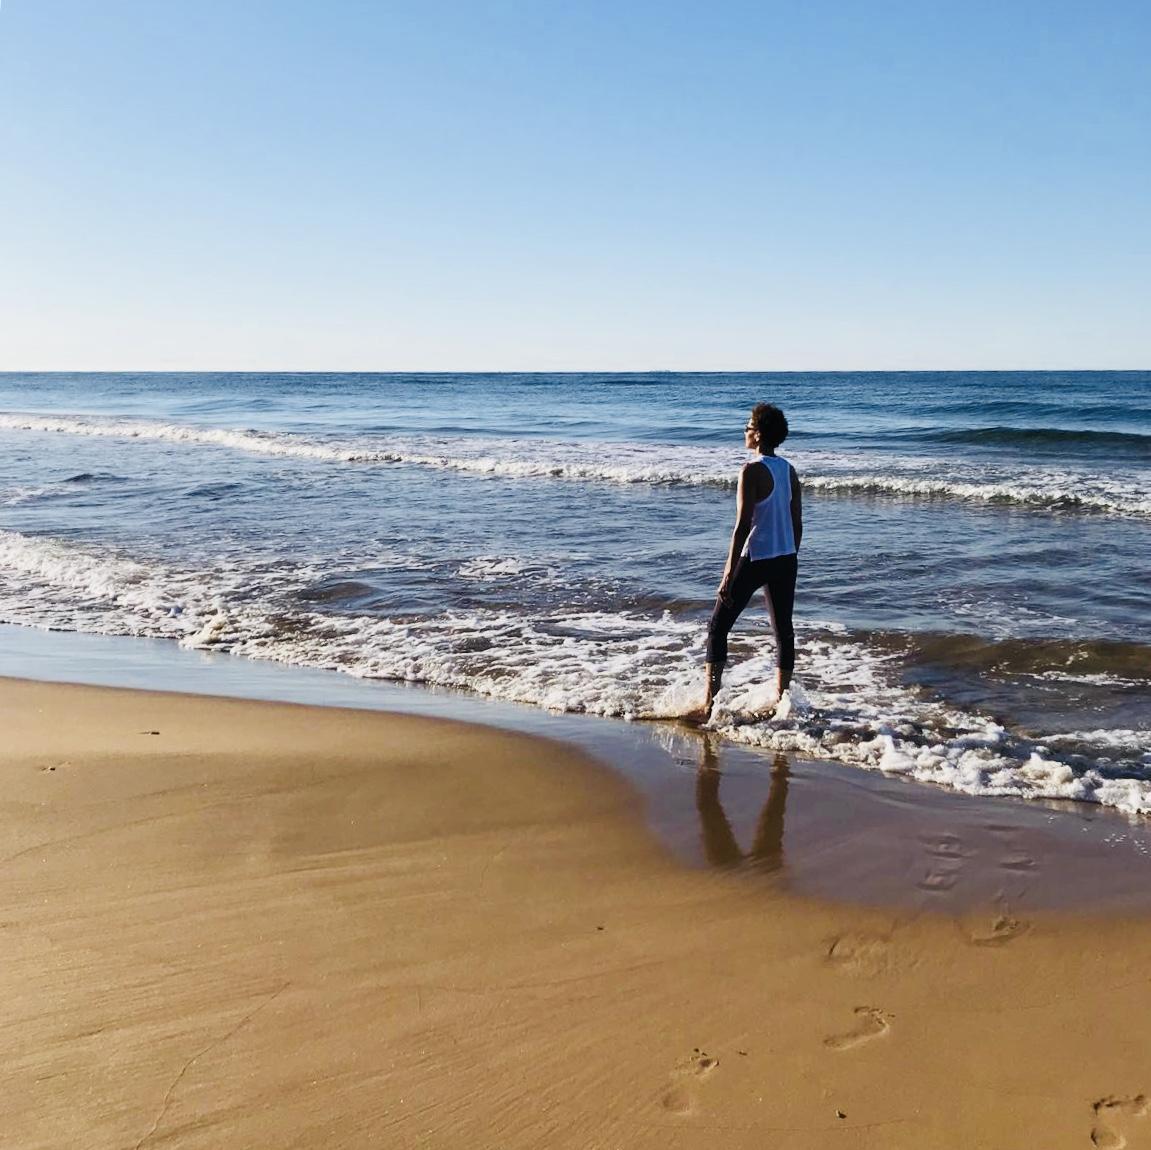 beach woman relaxation